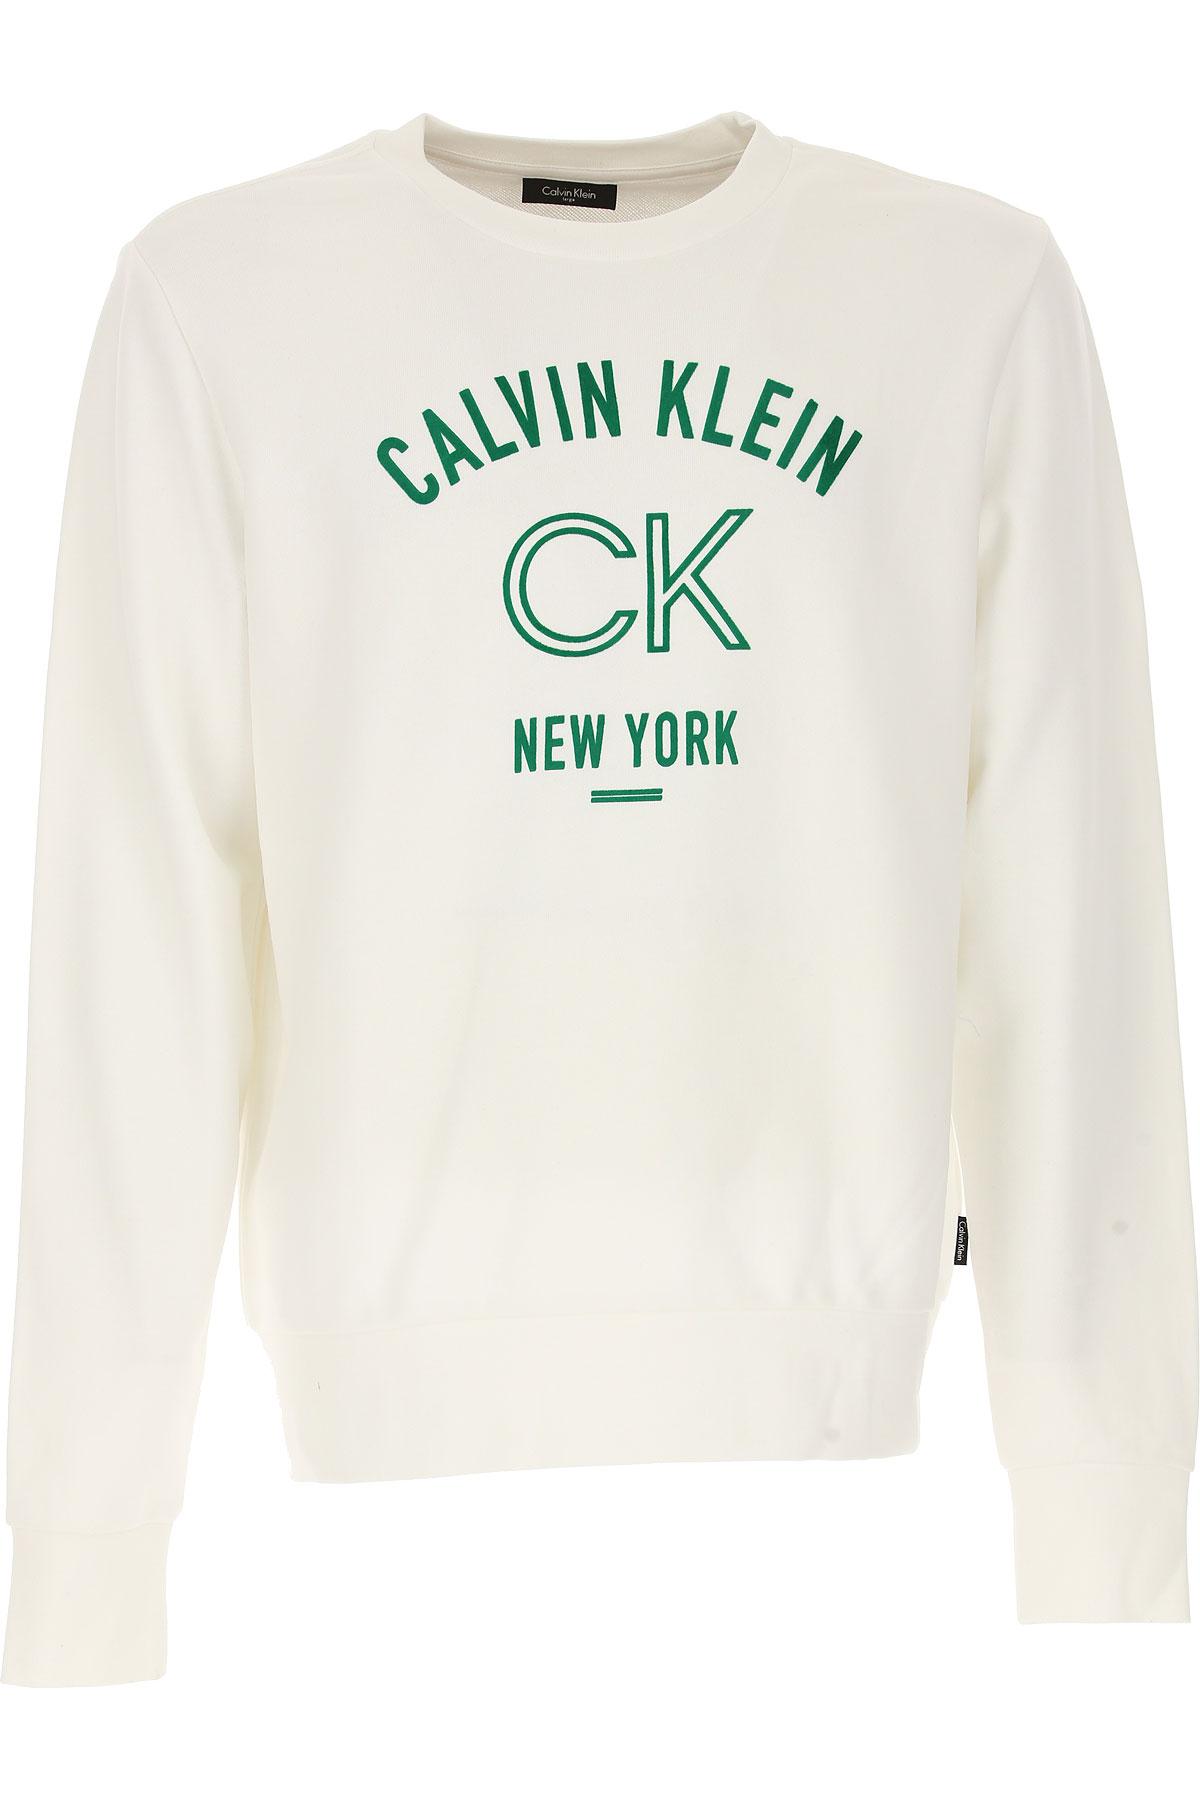 Calvin Klein Sweatshirt for Men, White, Cotton, 2017, L M S XL USA-467656